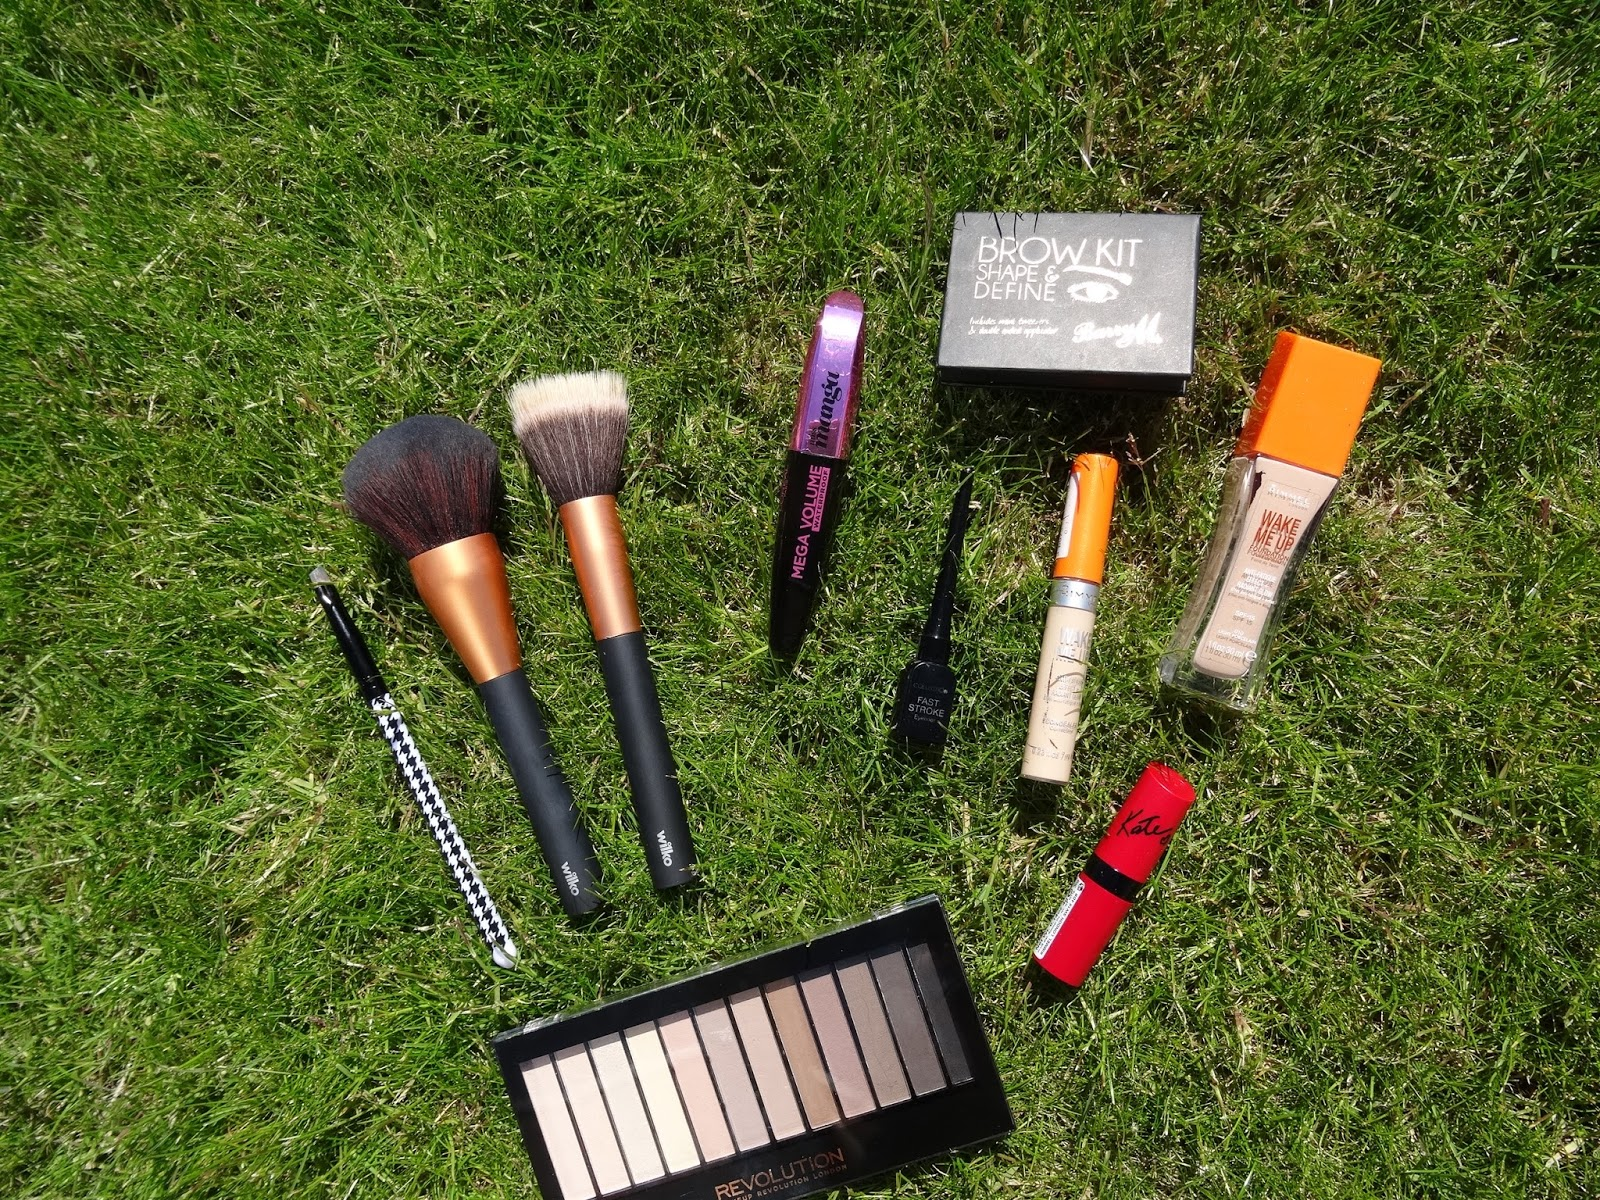 Rimmel, Wilko, Makeup, Collection, L'Oreal, Makeup Revolution